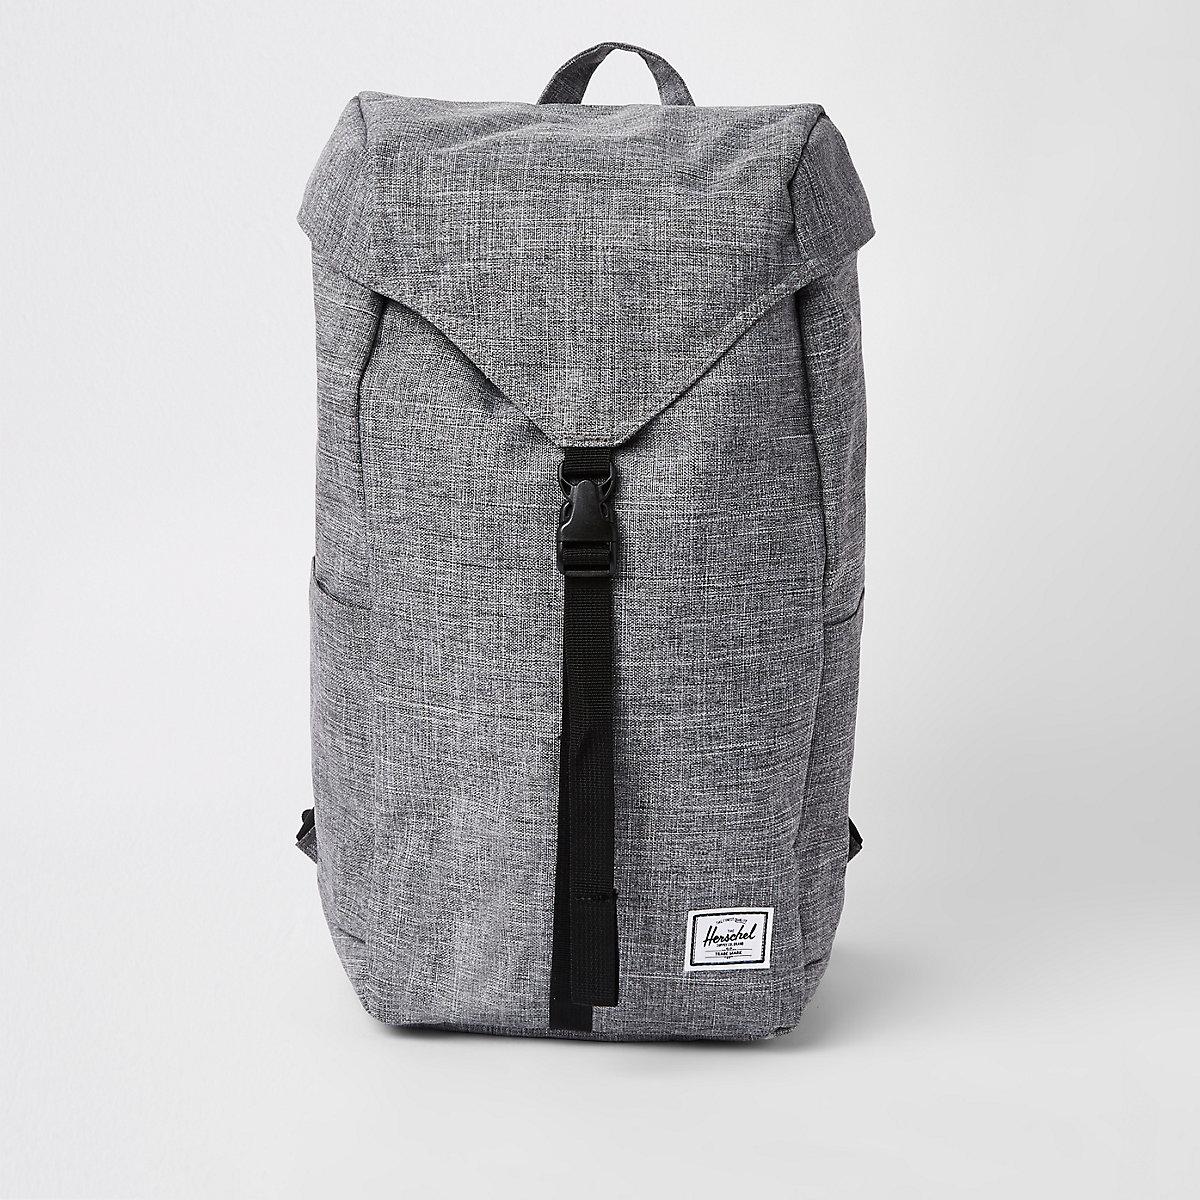 Herschel grey Thompson backpack